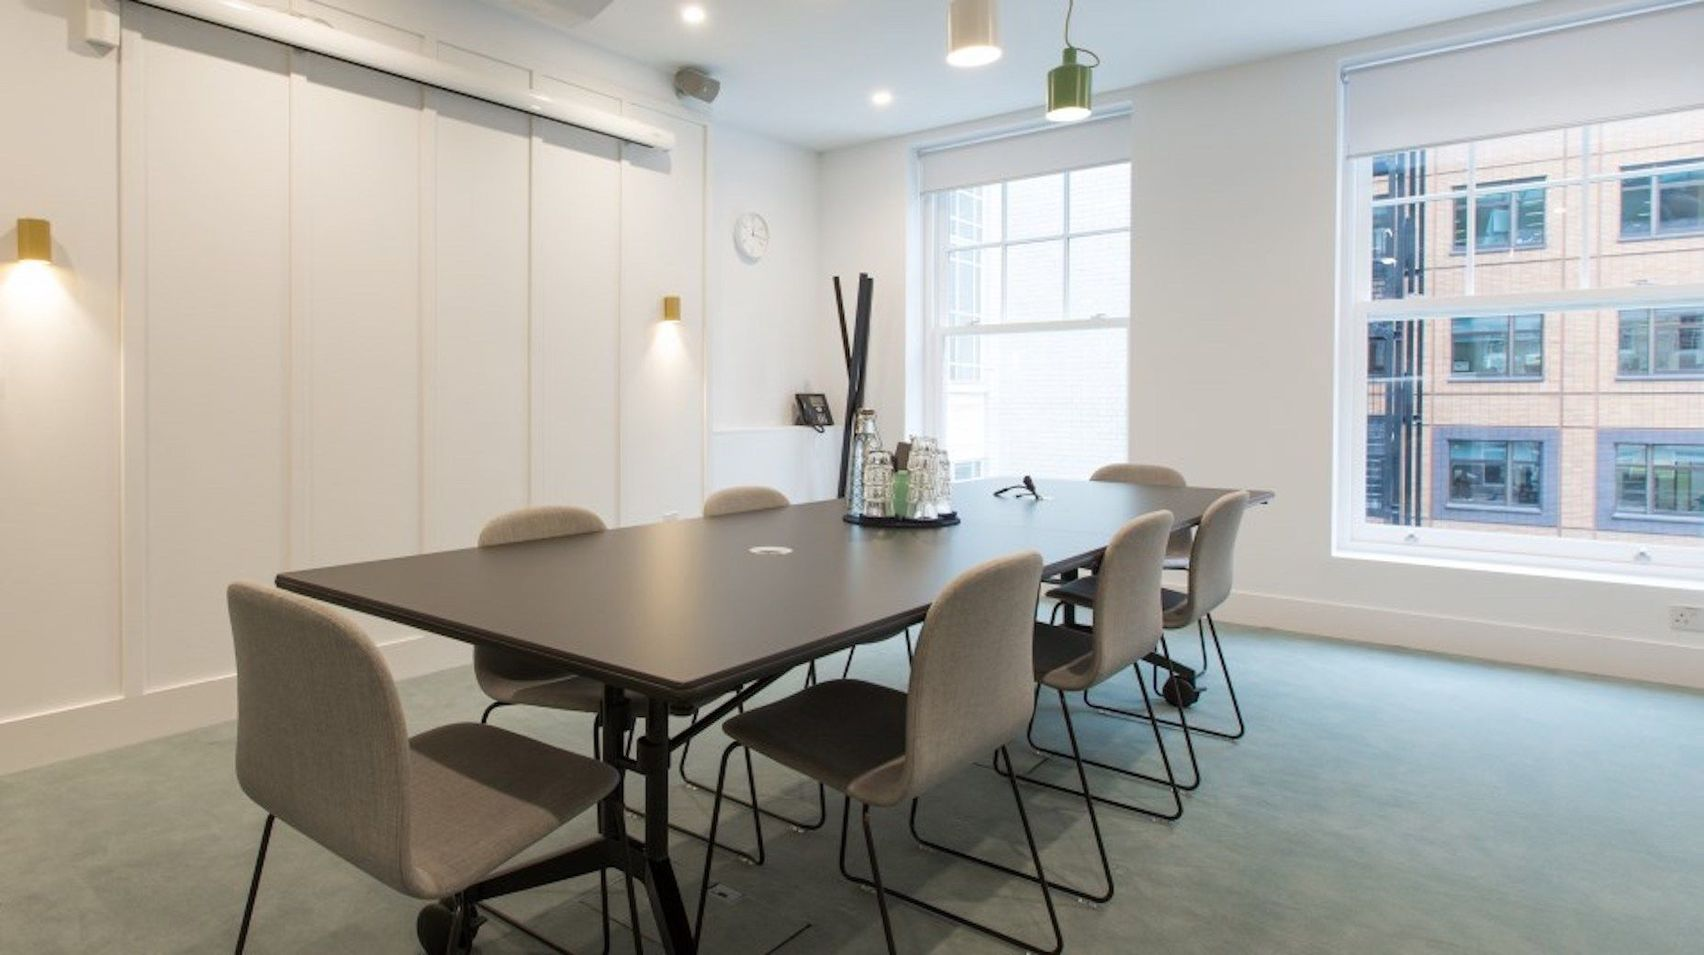 Meeting Room 2, TOG, 91 Wimpole Street